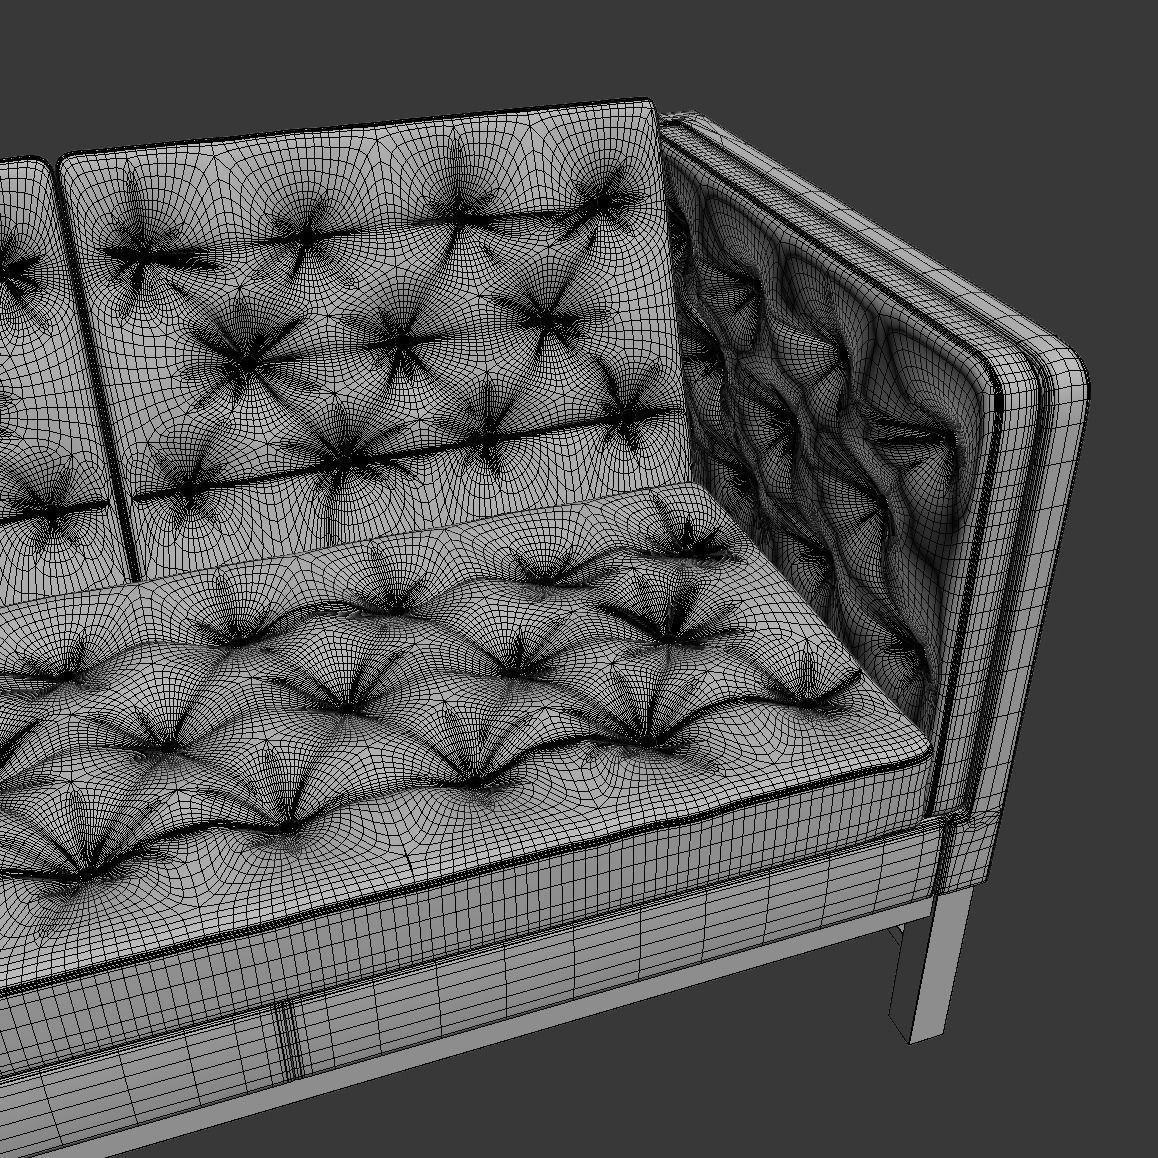 erik jorgensen ej 315 sofa 3set 3d model max. Black Bedroom Furniture Sets. Home Design Ideas